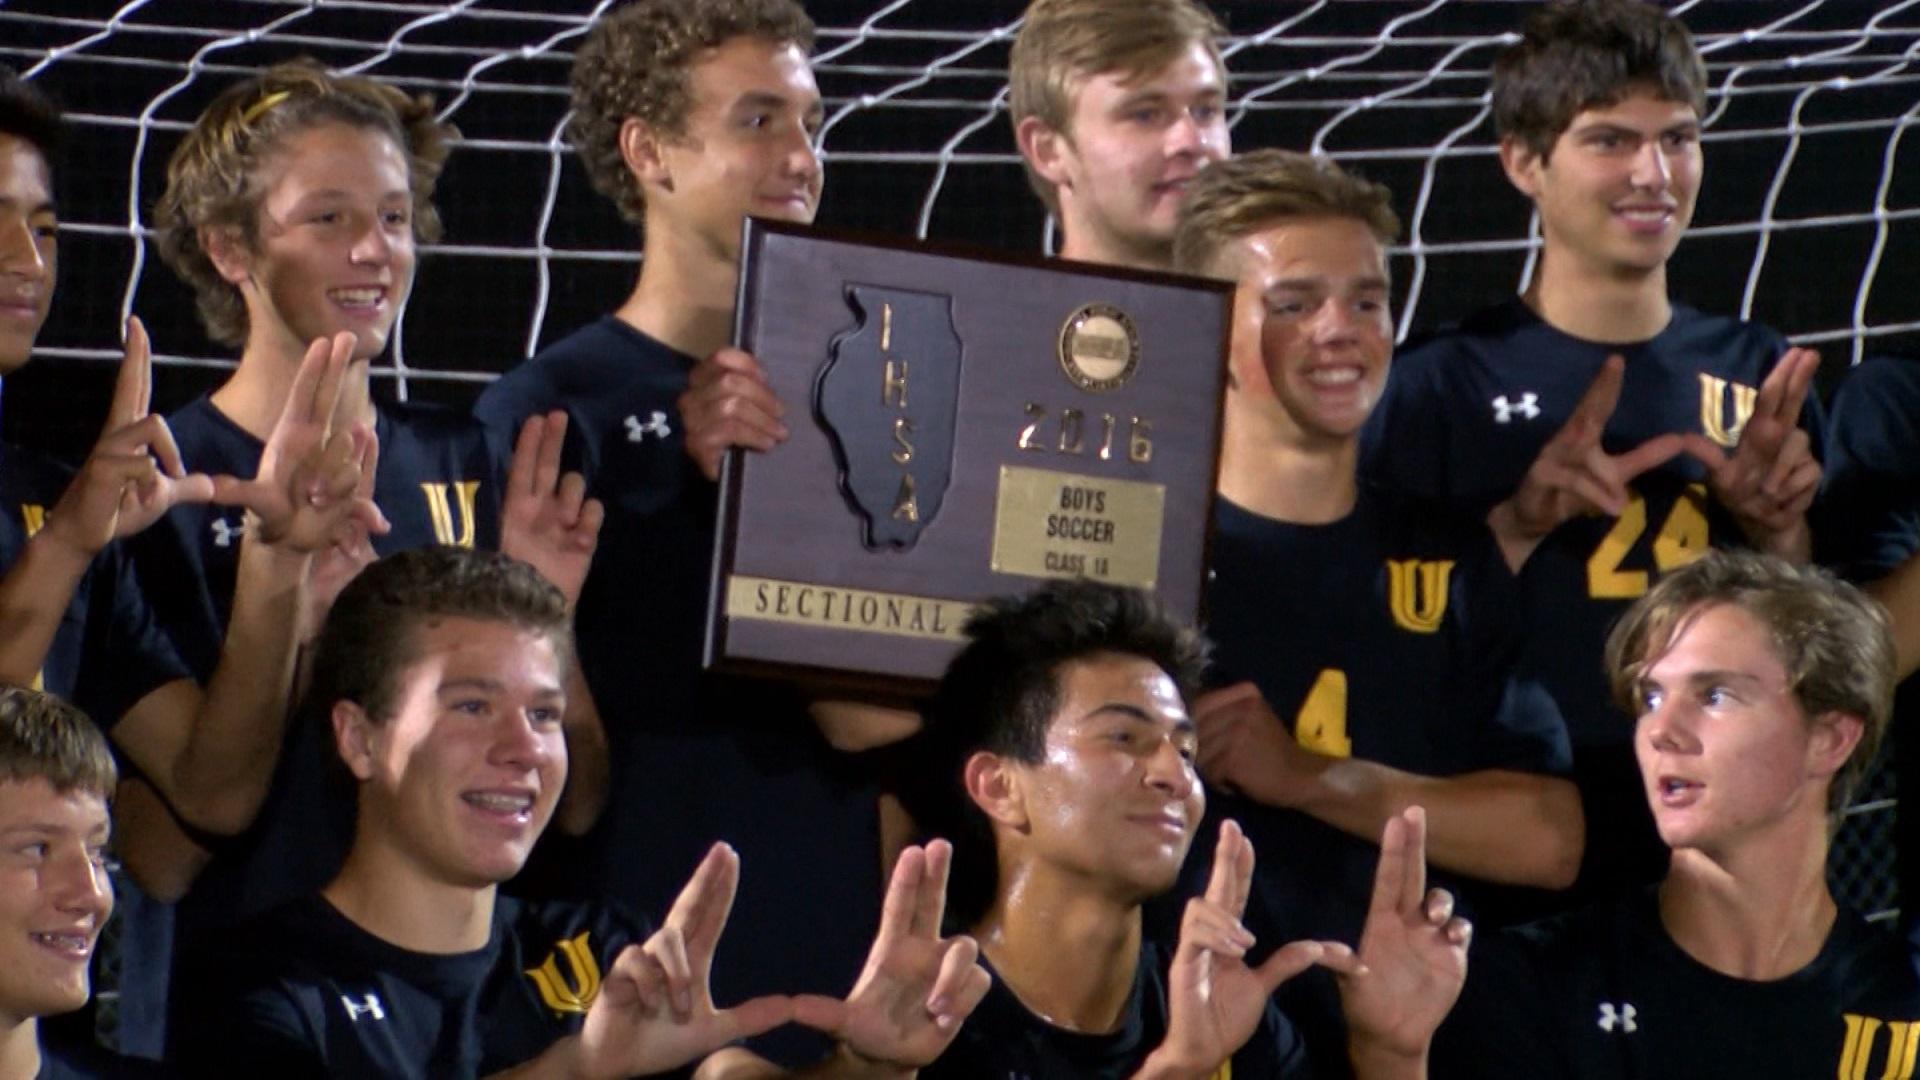 U-High wins soccer sectional